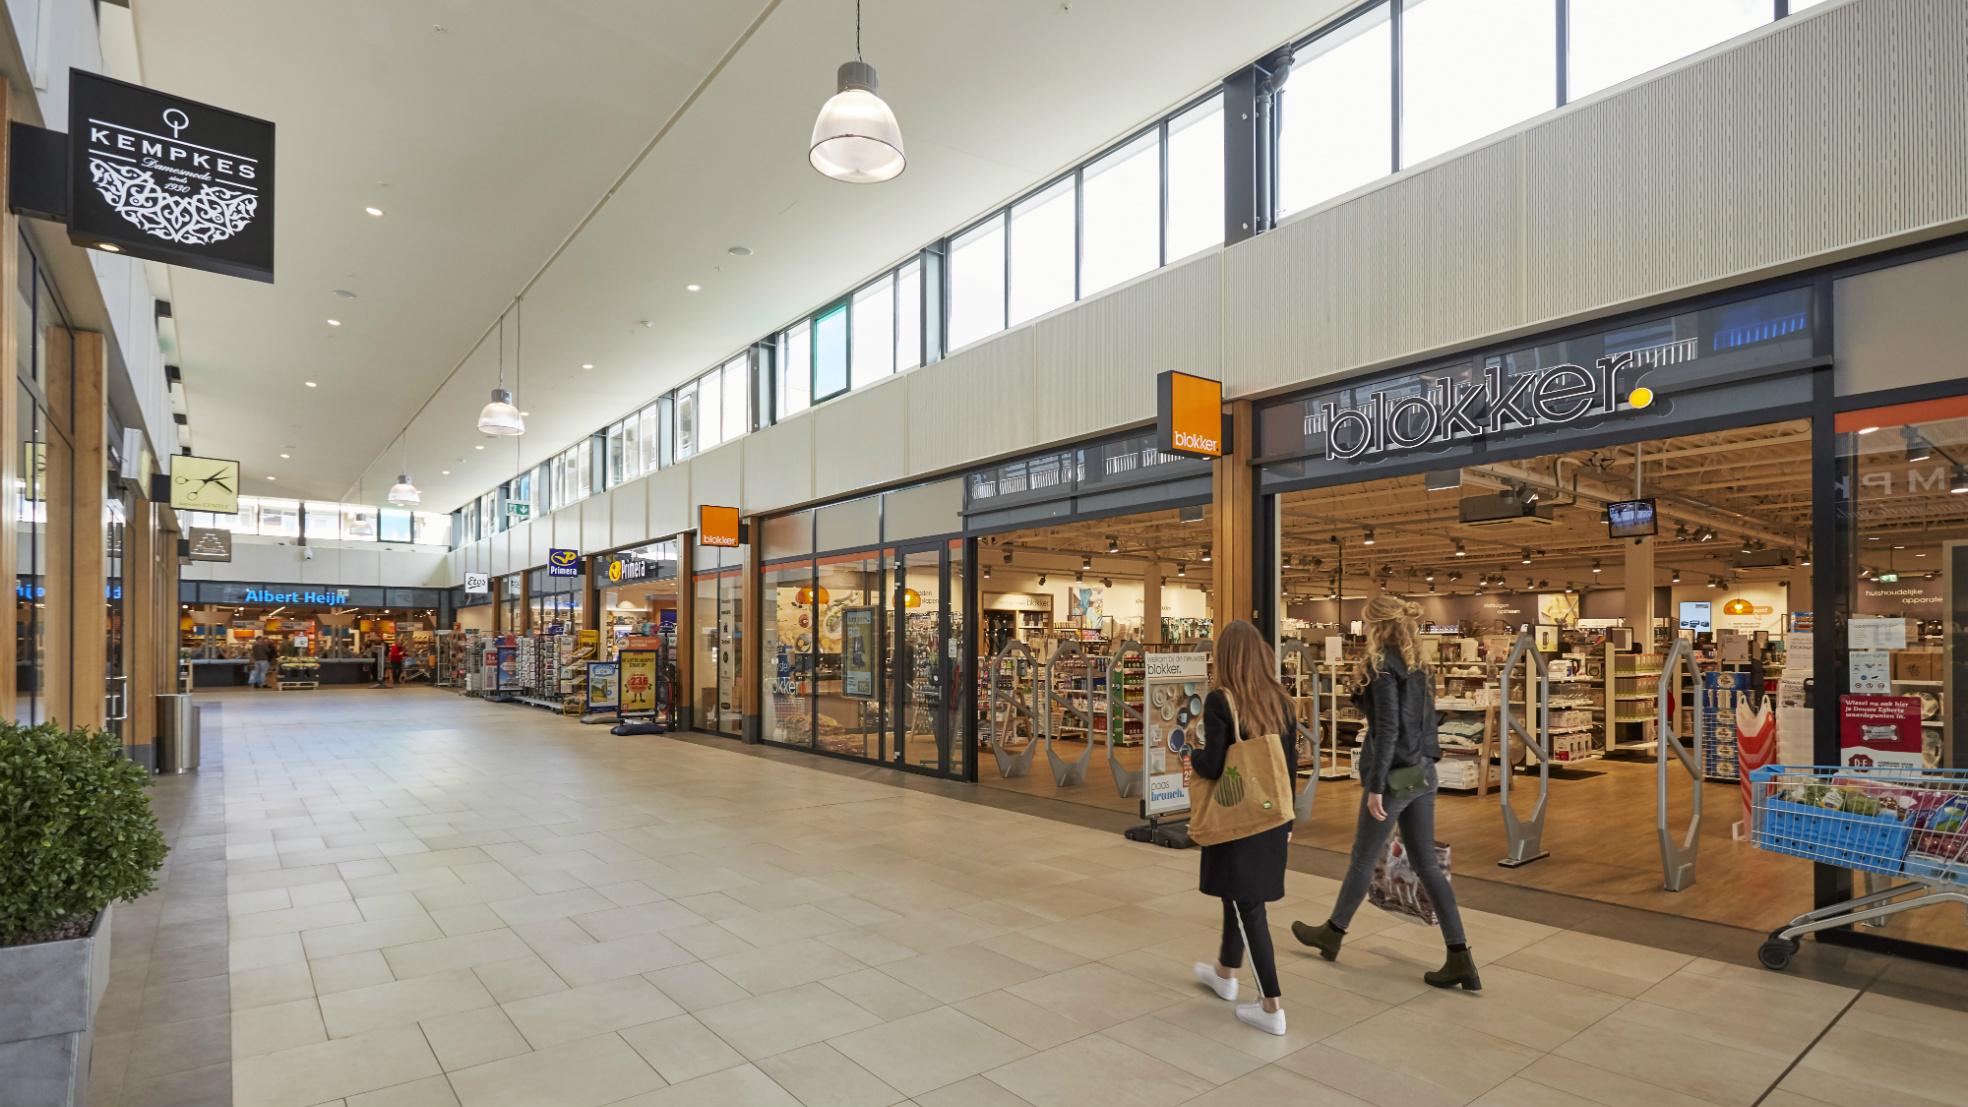 Winkelcentrum Kerkelanden Hilversum